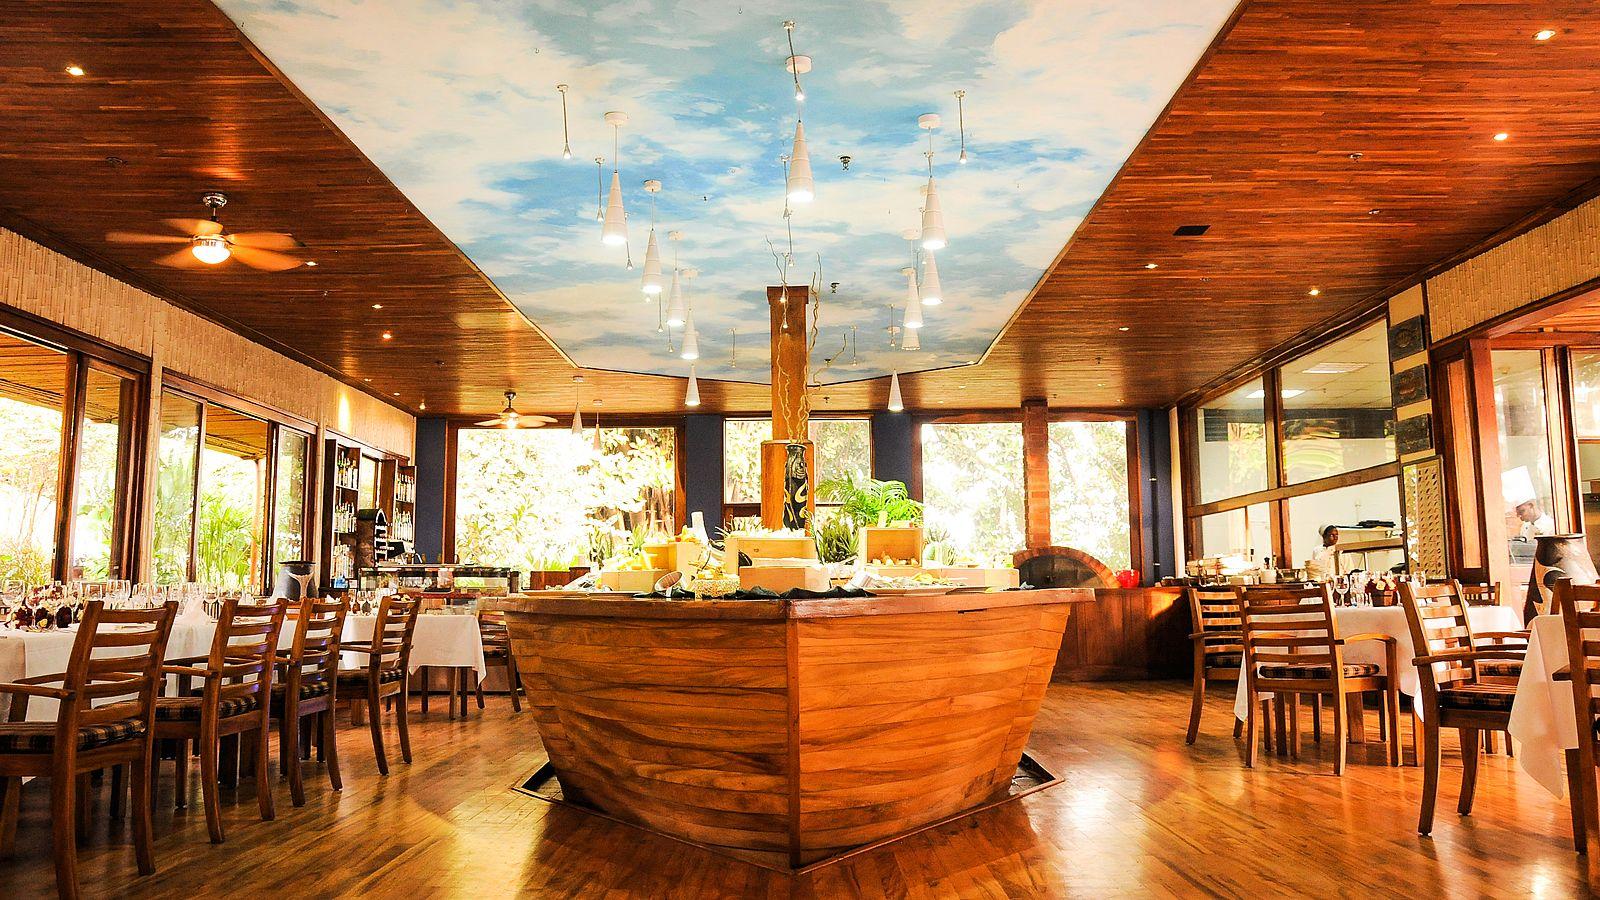 Seven Seas Restaurant Setting